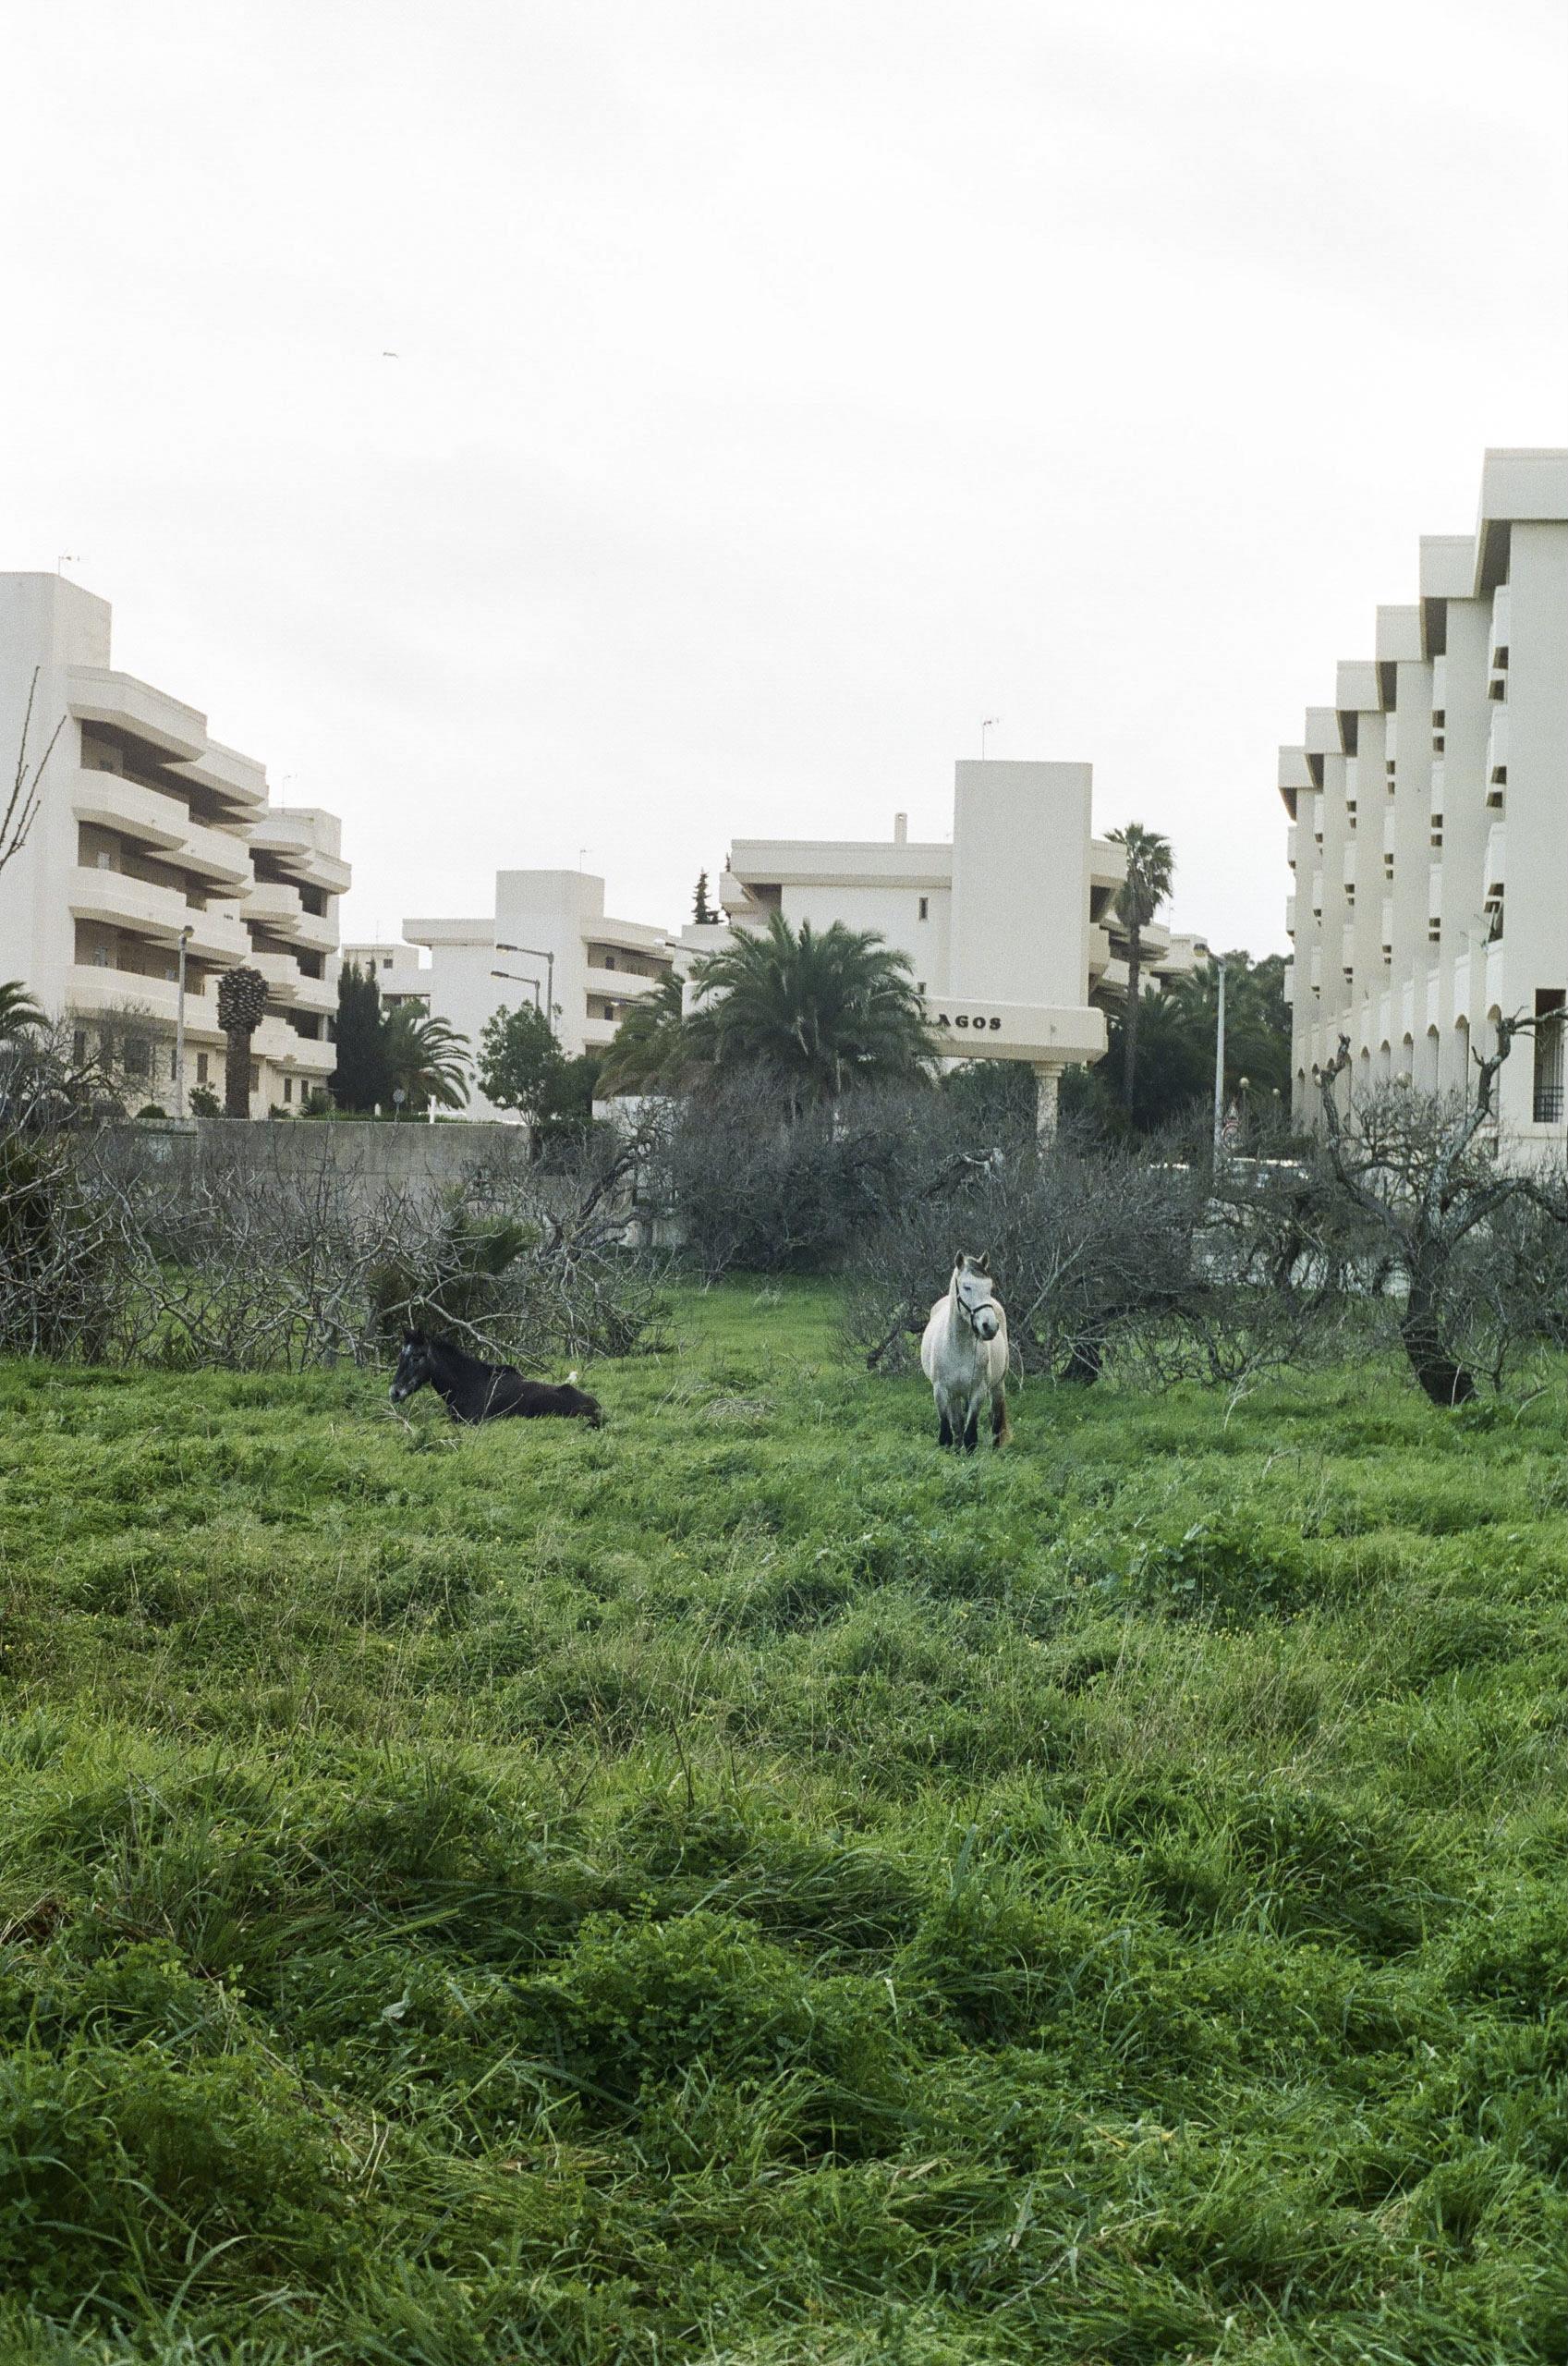 Nate Lerner, Lagos, Portugal (2017)